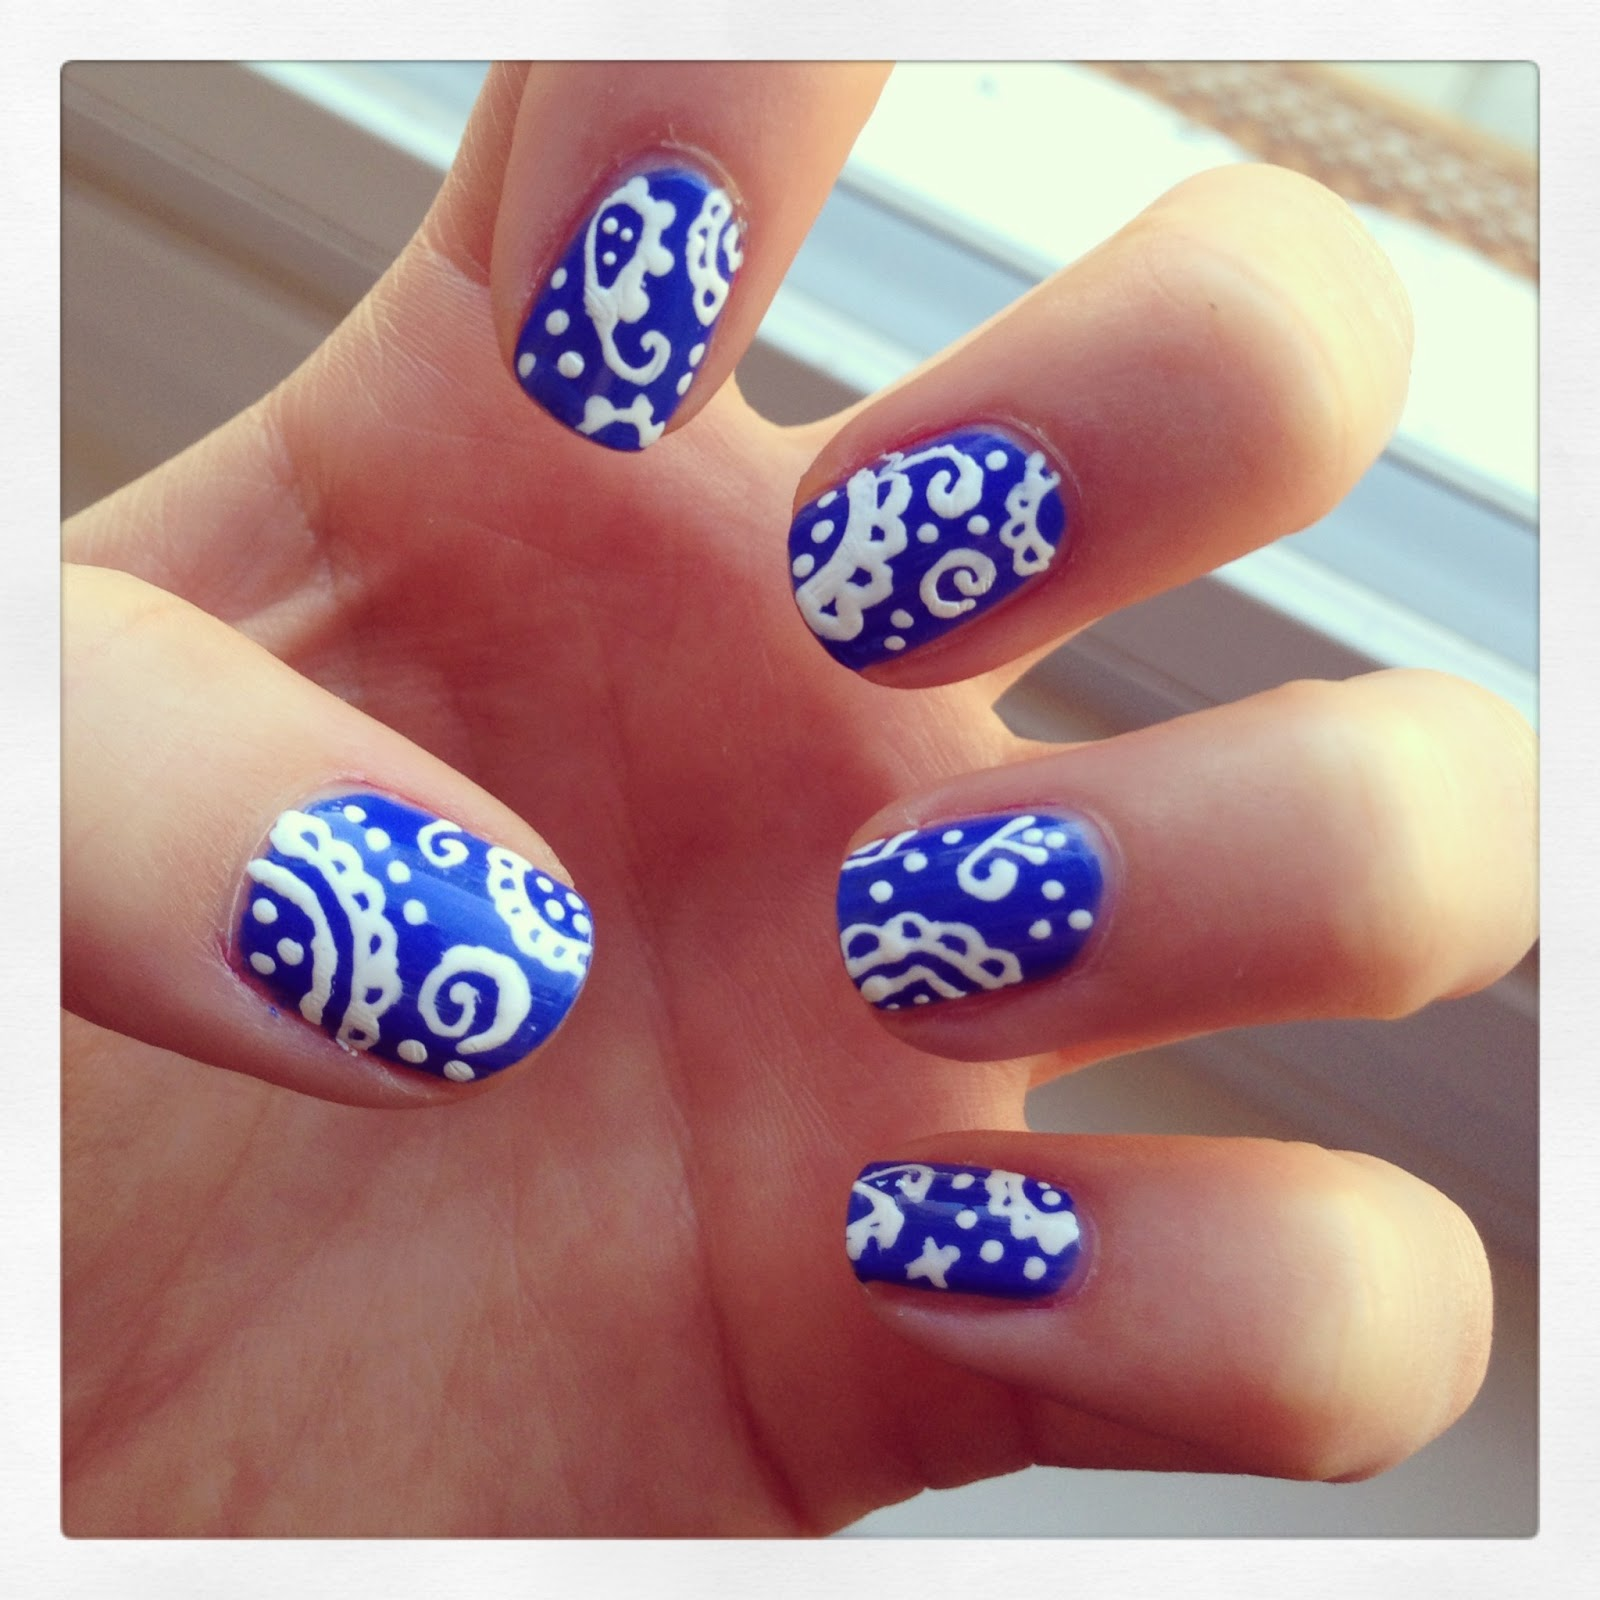 I Wish I Could Wink: Paisley Nails